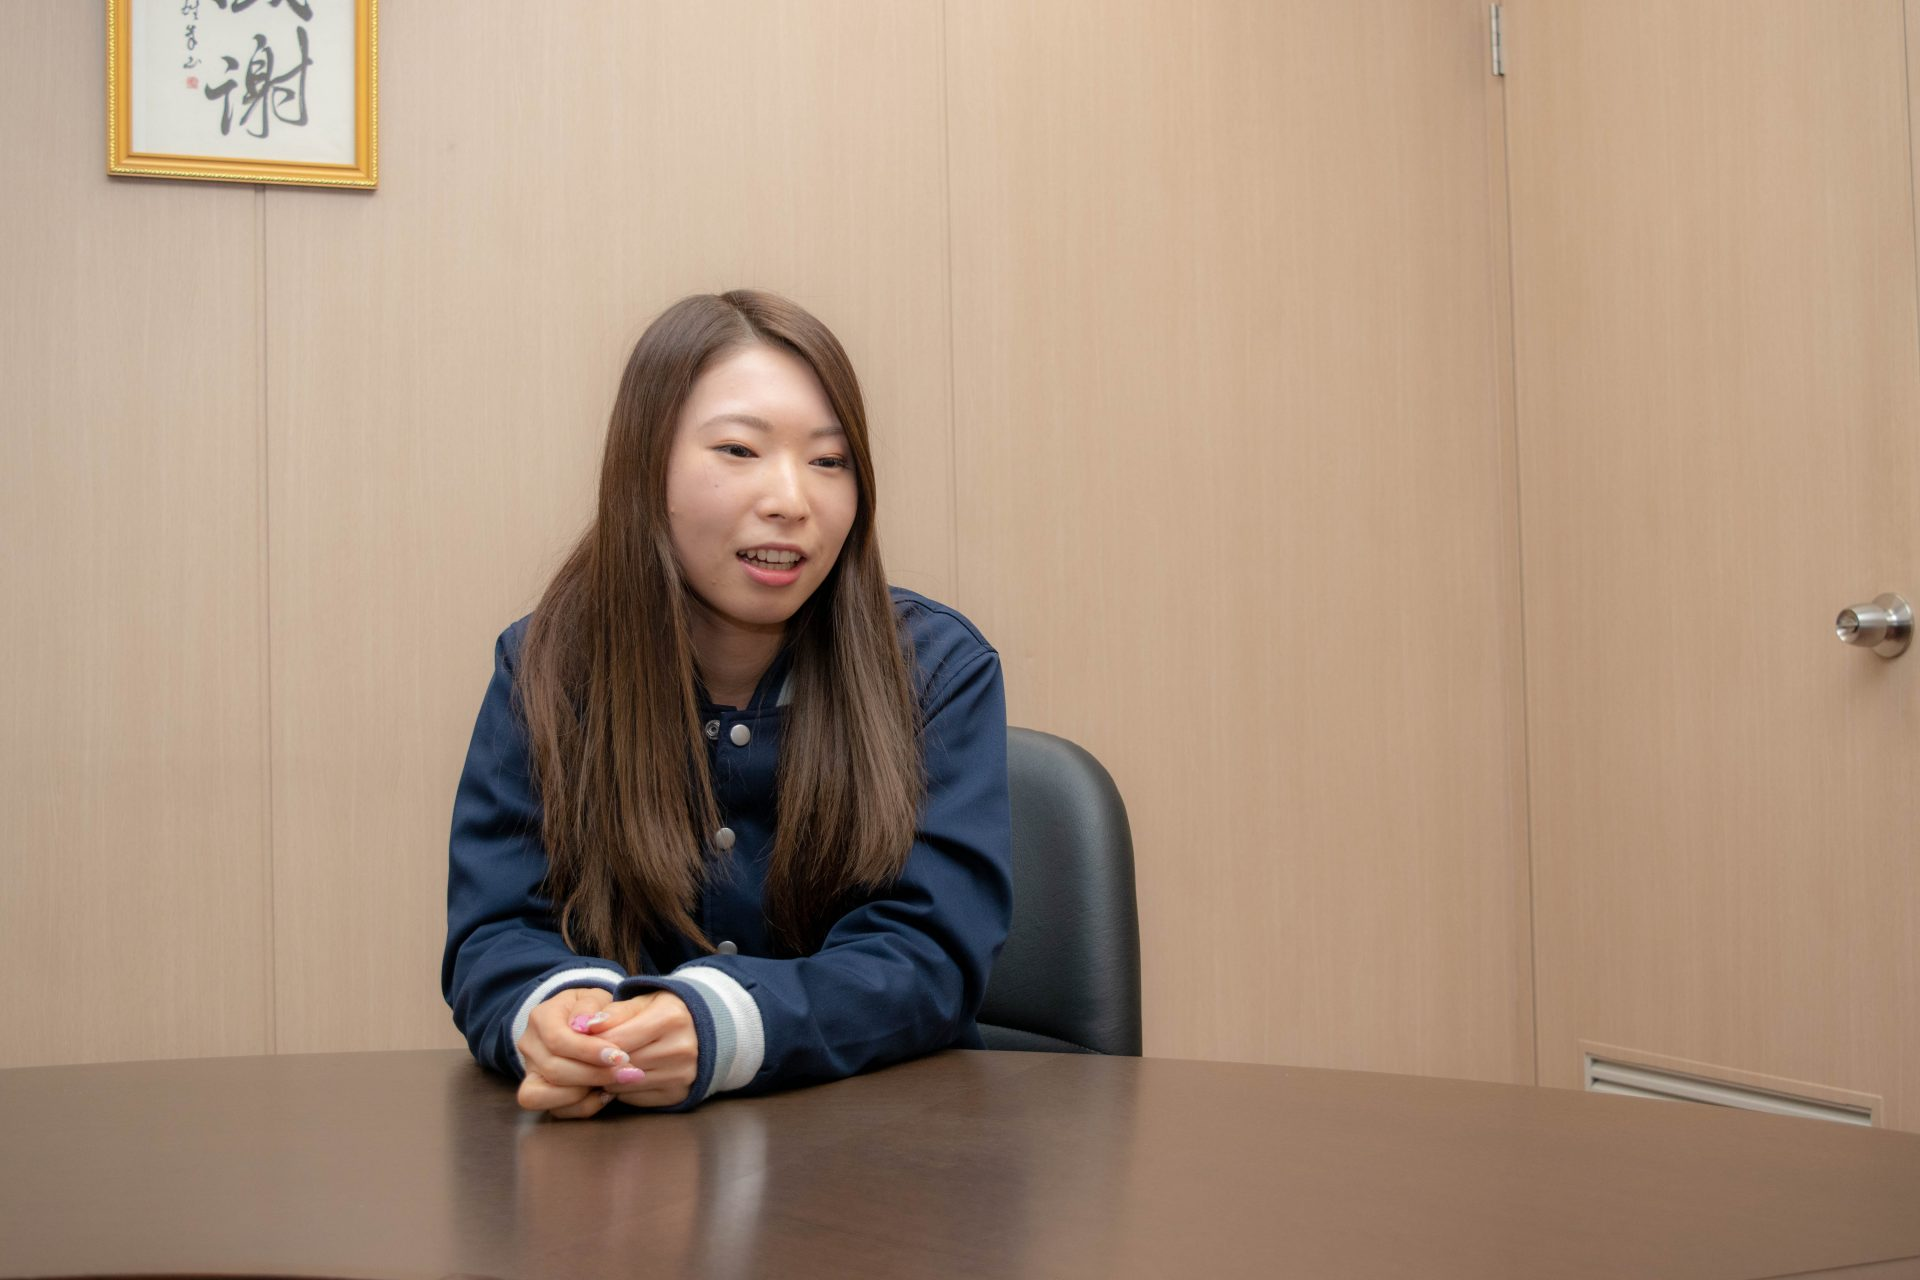 坪井里紗の写真